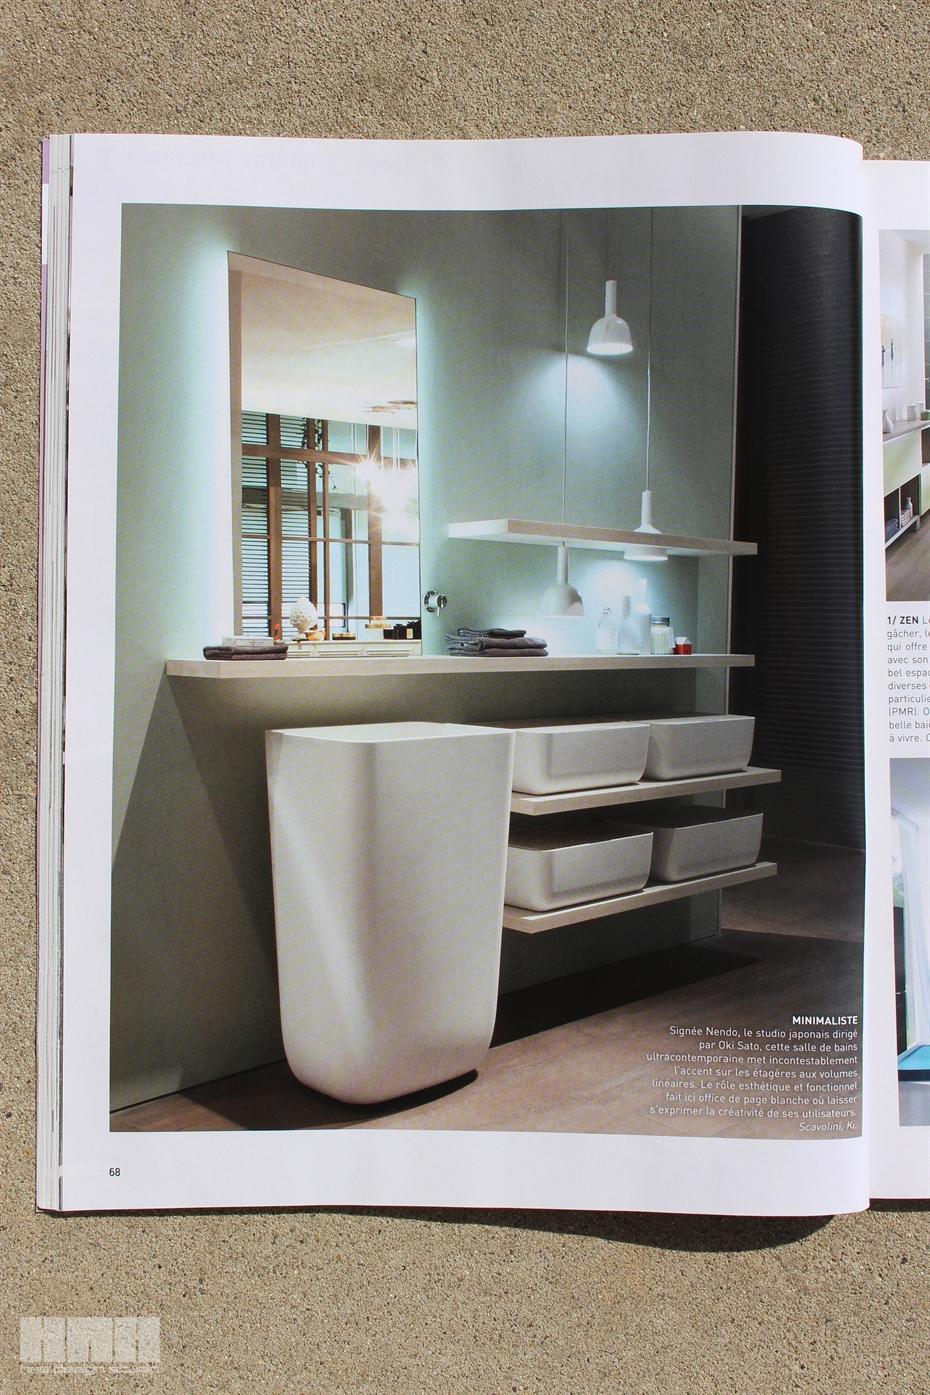 hna design cuisines and bains 2014 november december 12